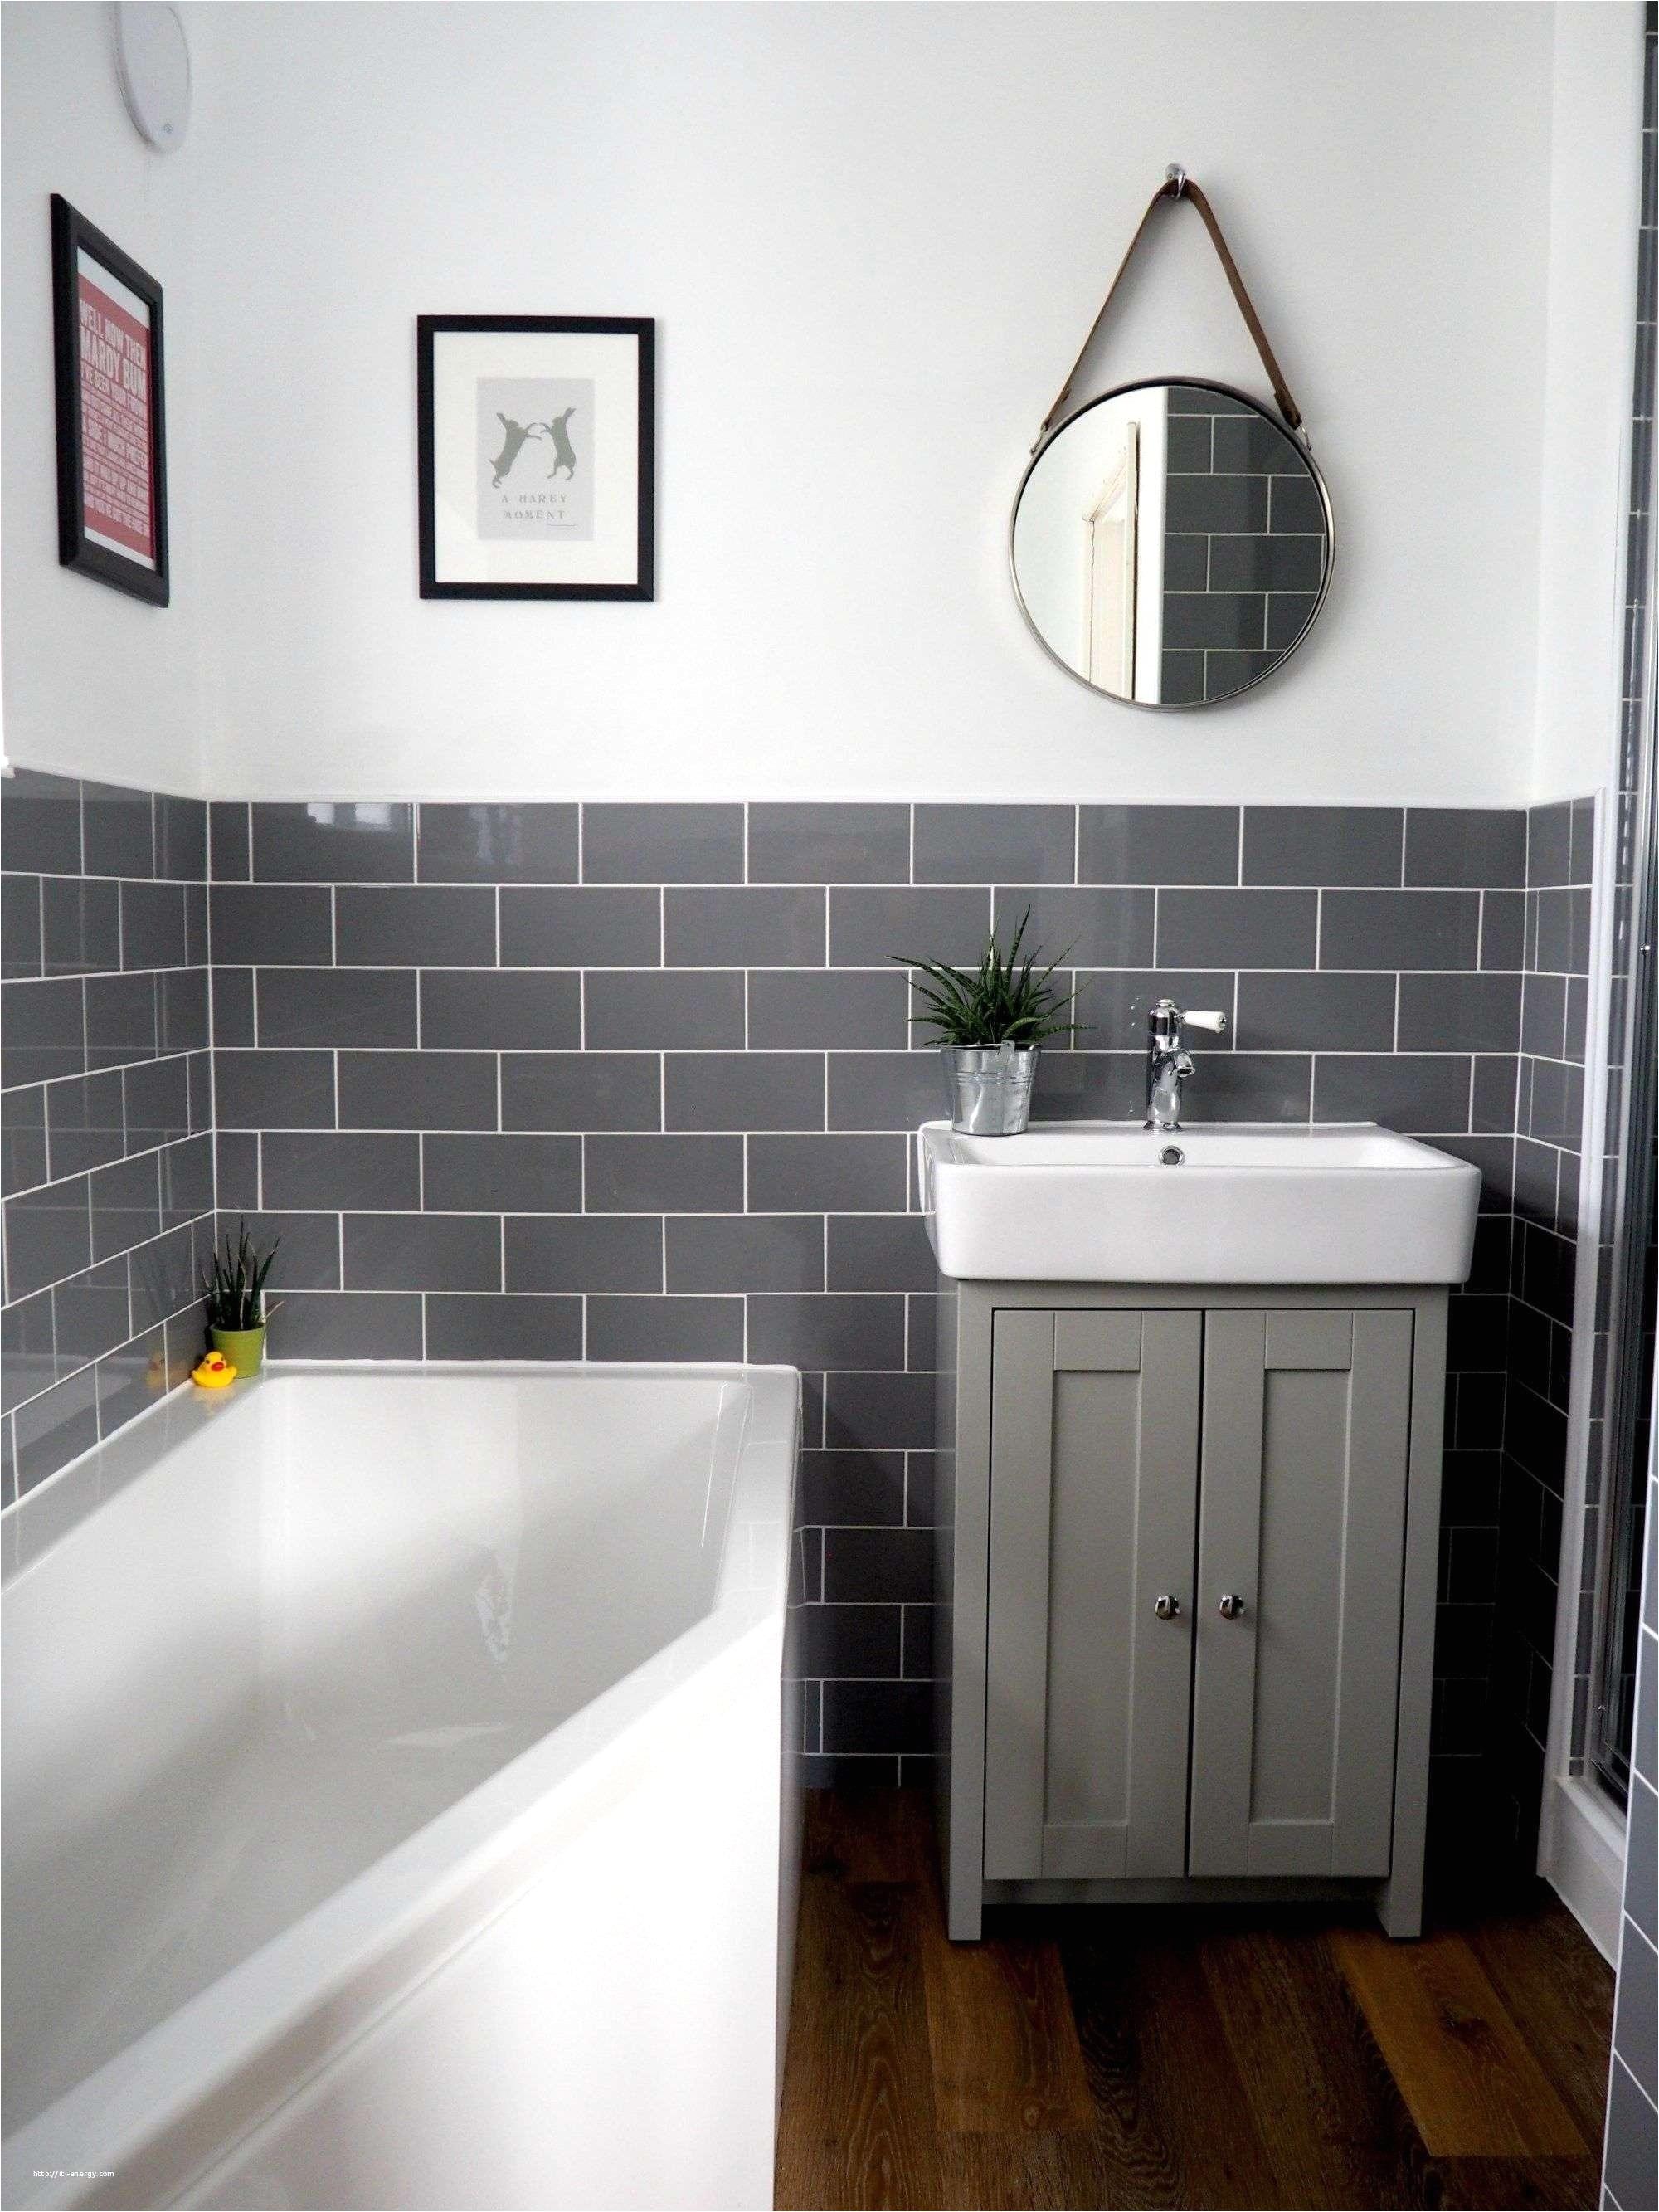 Luxury Bathrooms New Bathroom Design Tips Home Design